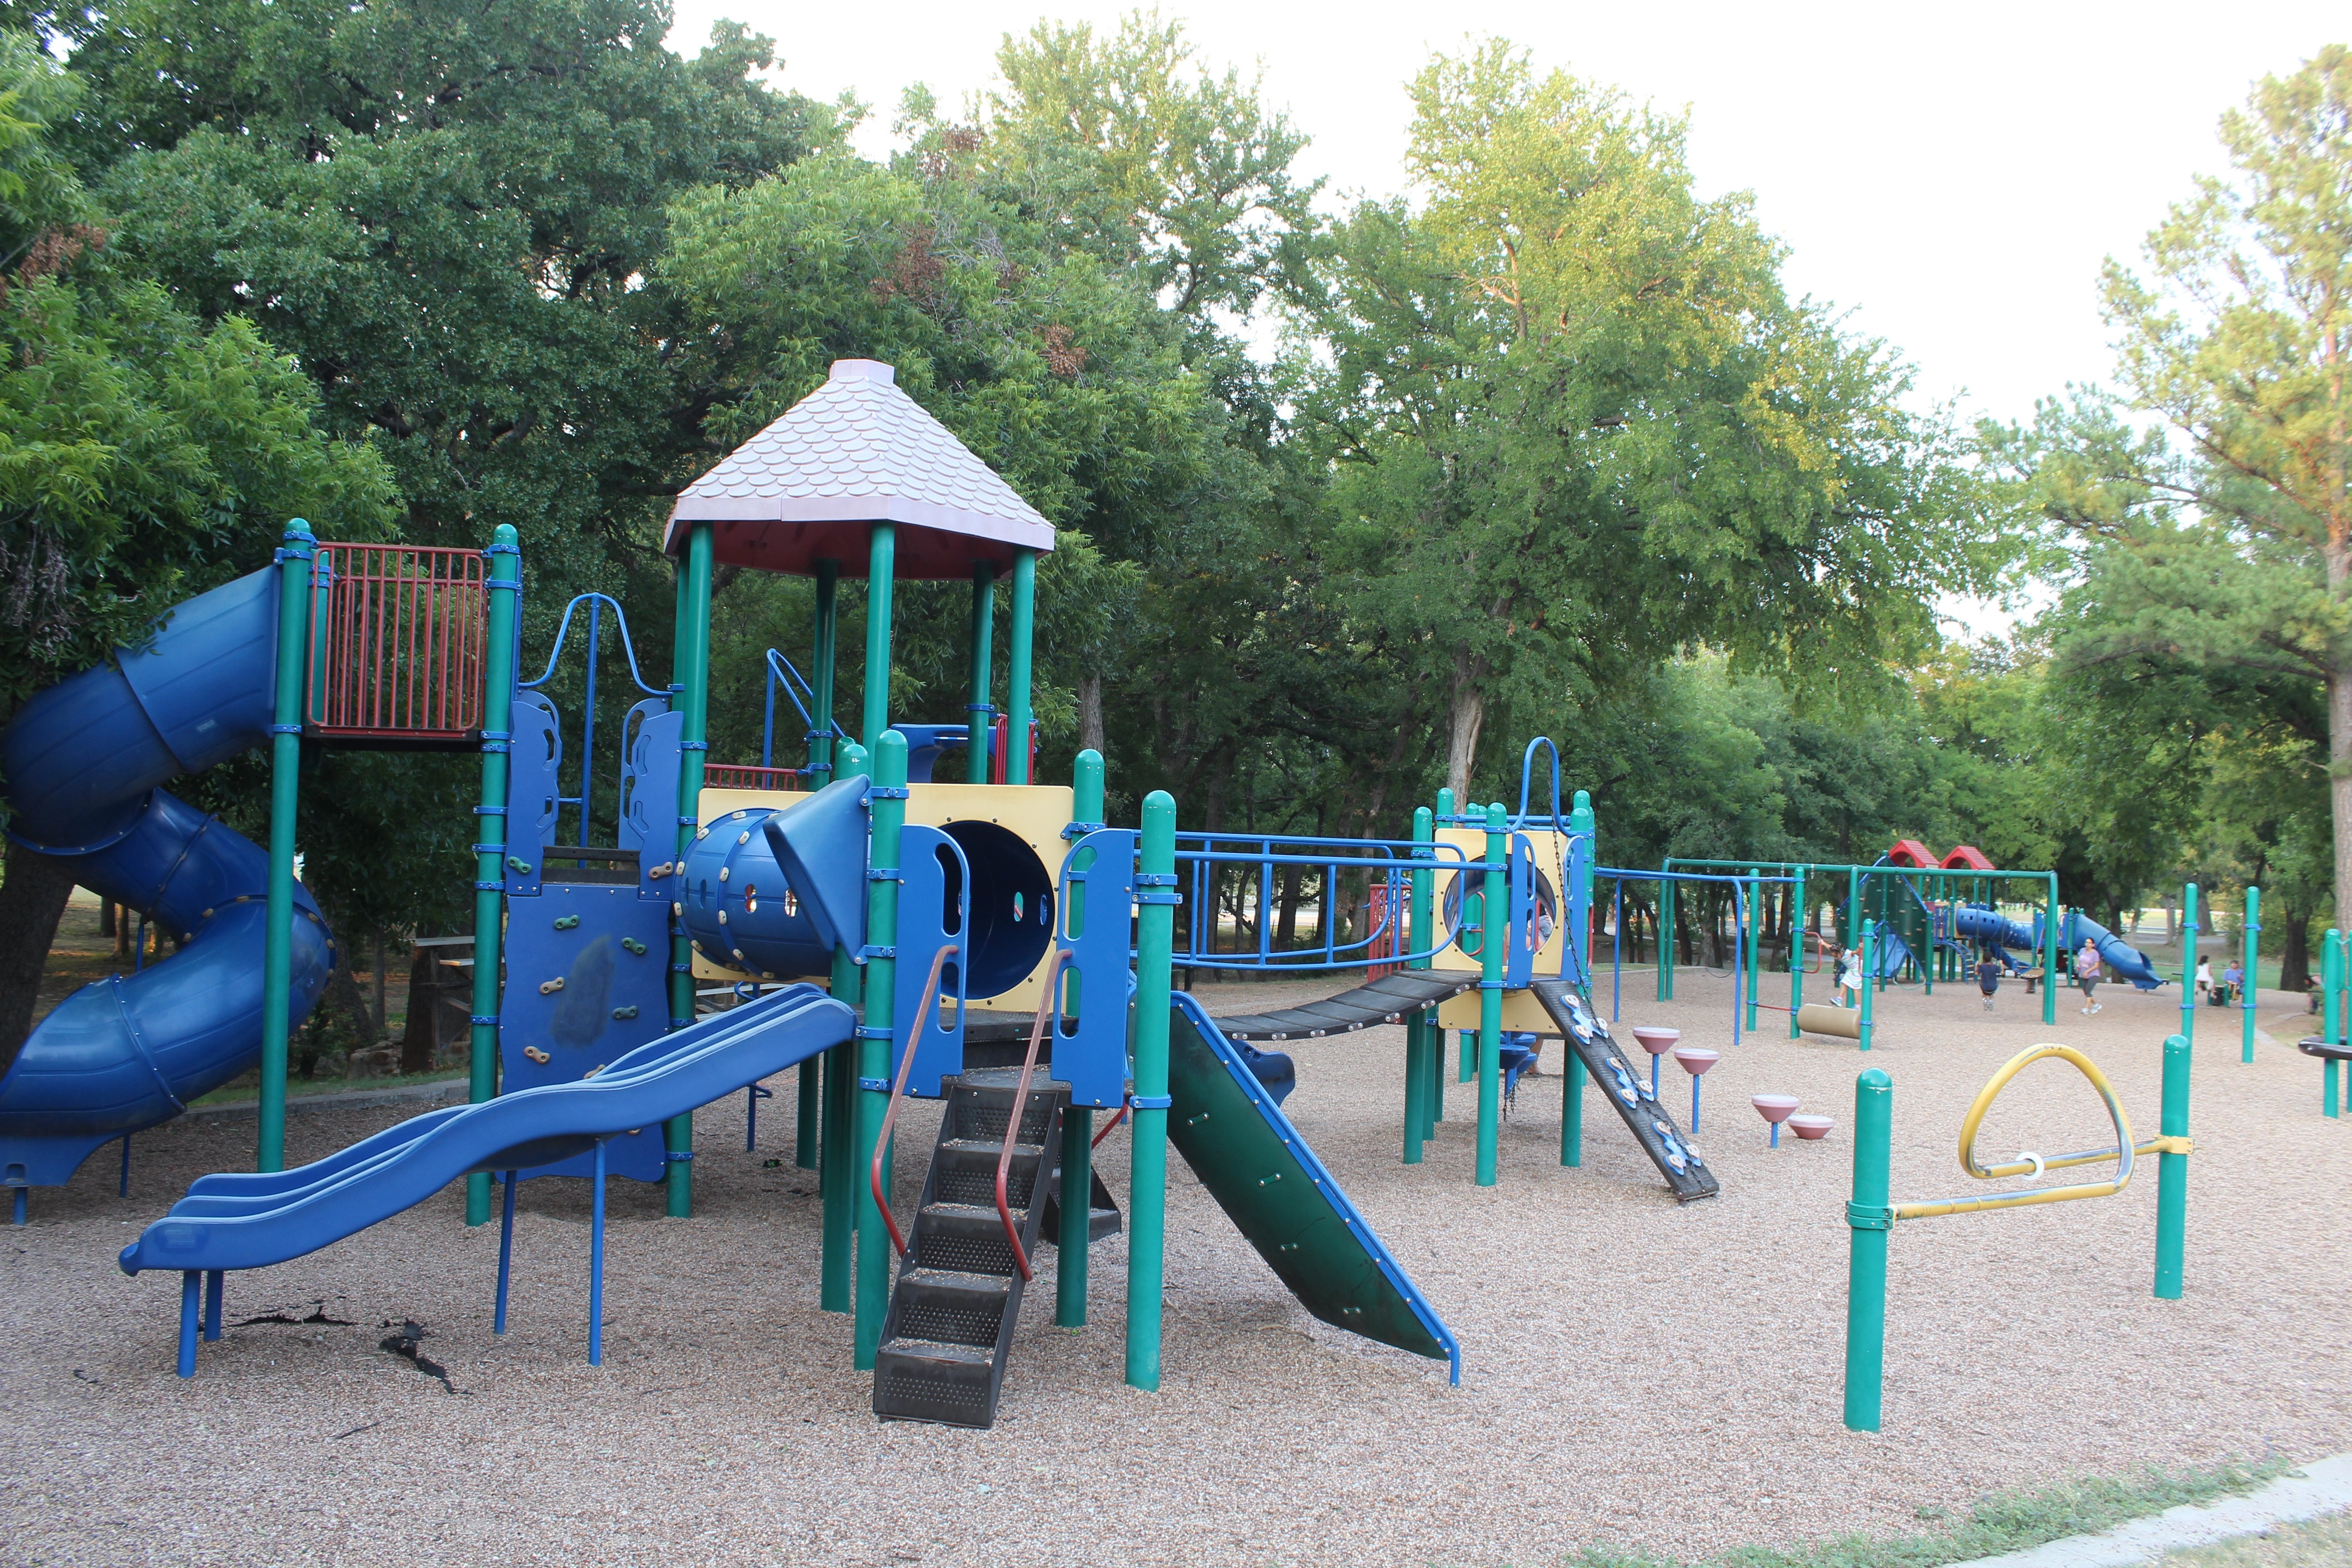 Firemen playground